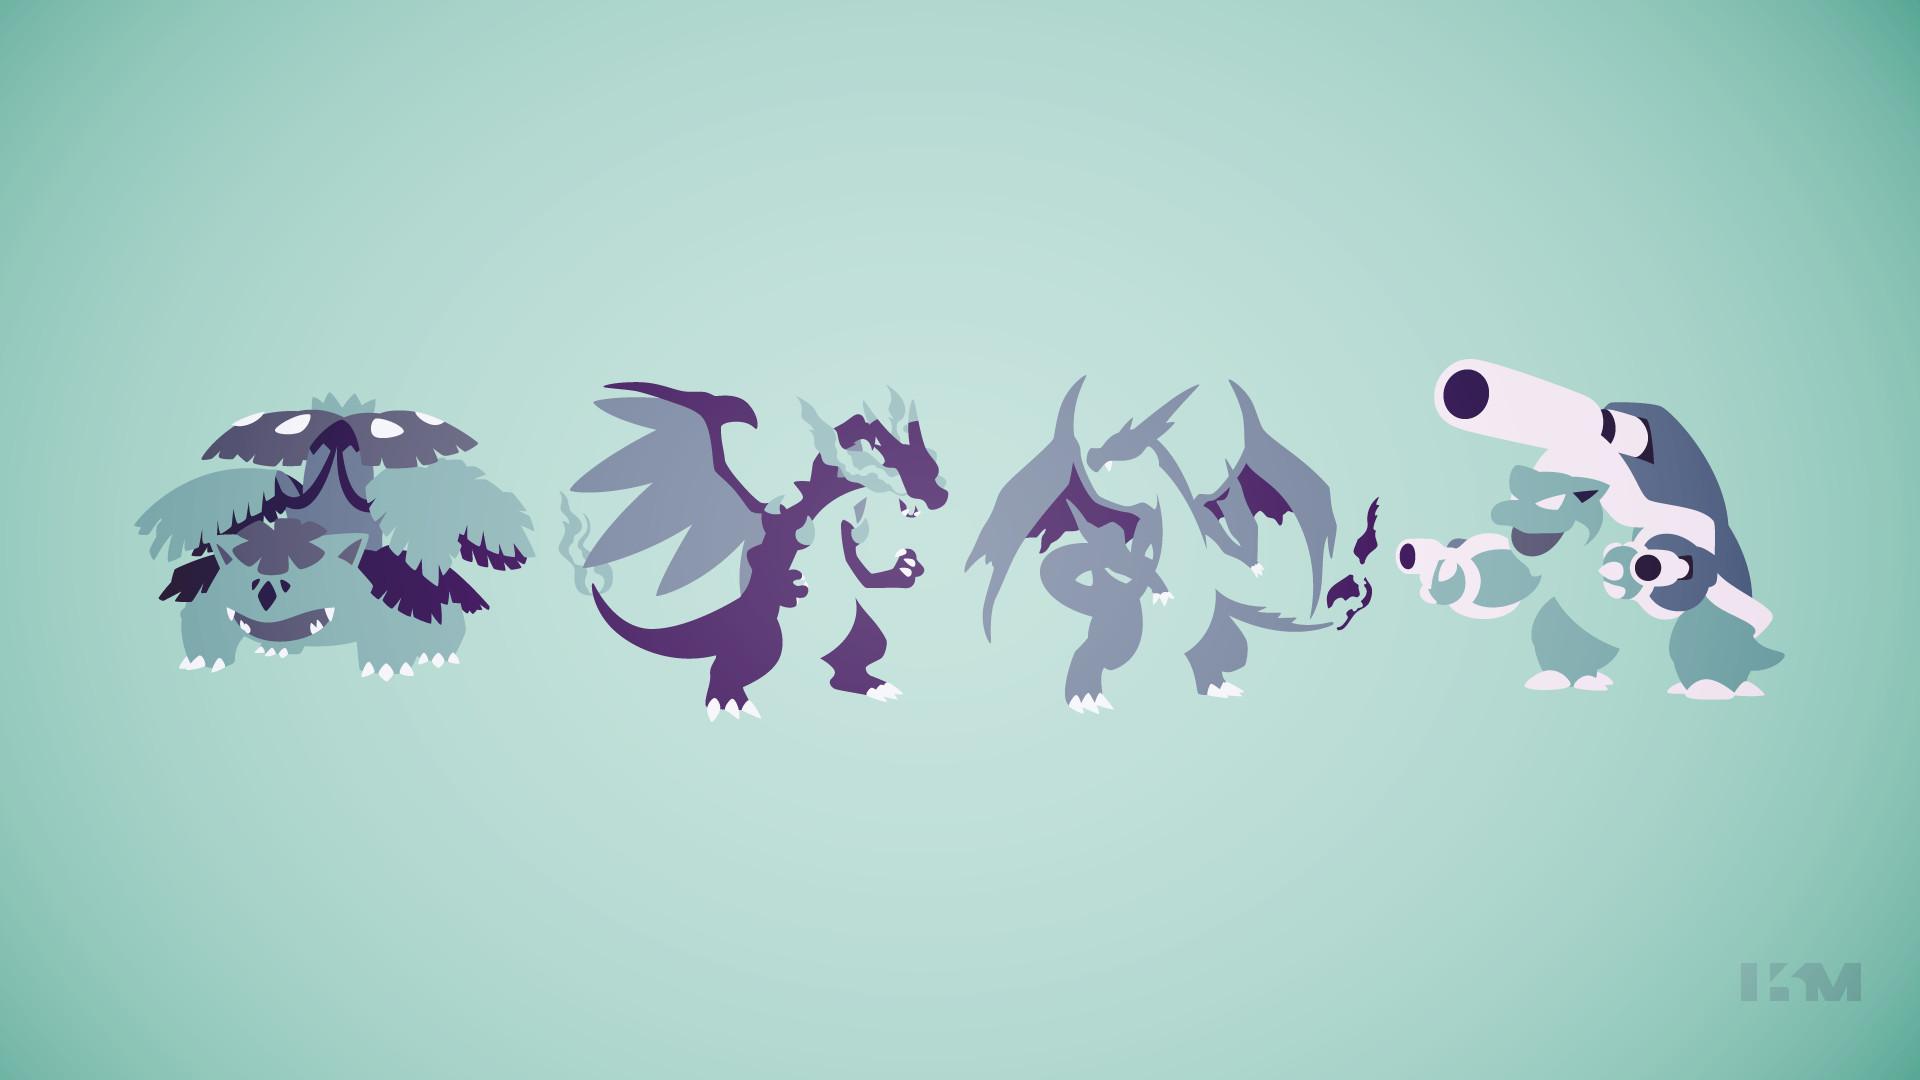 1 Mega Venusaur (Pokemon) HD Wallpapers   Backgrounds – Wallpaper Abyss